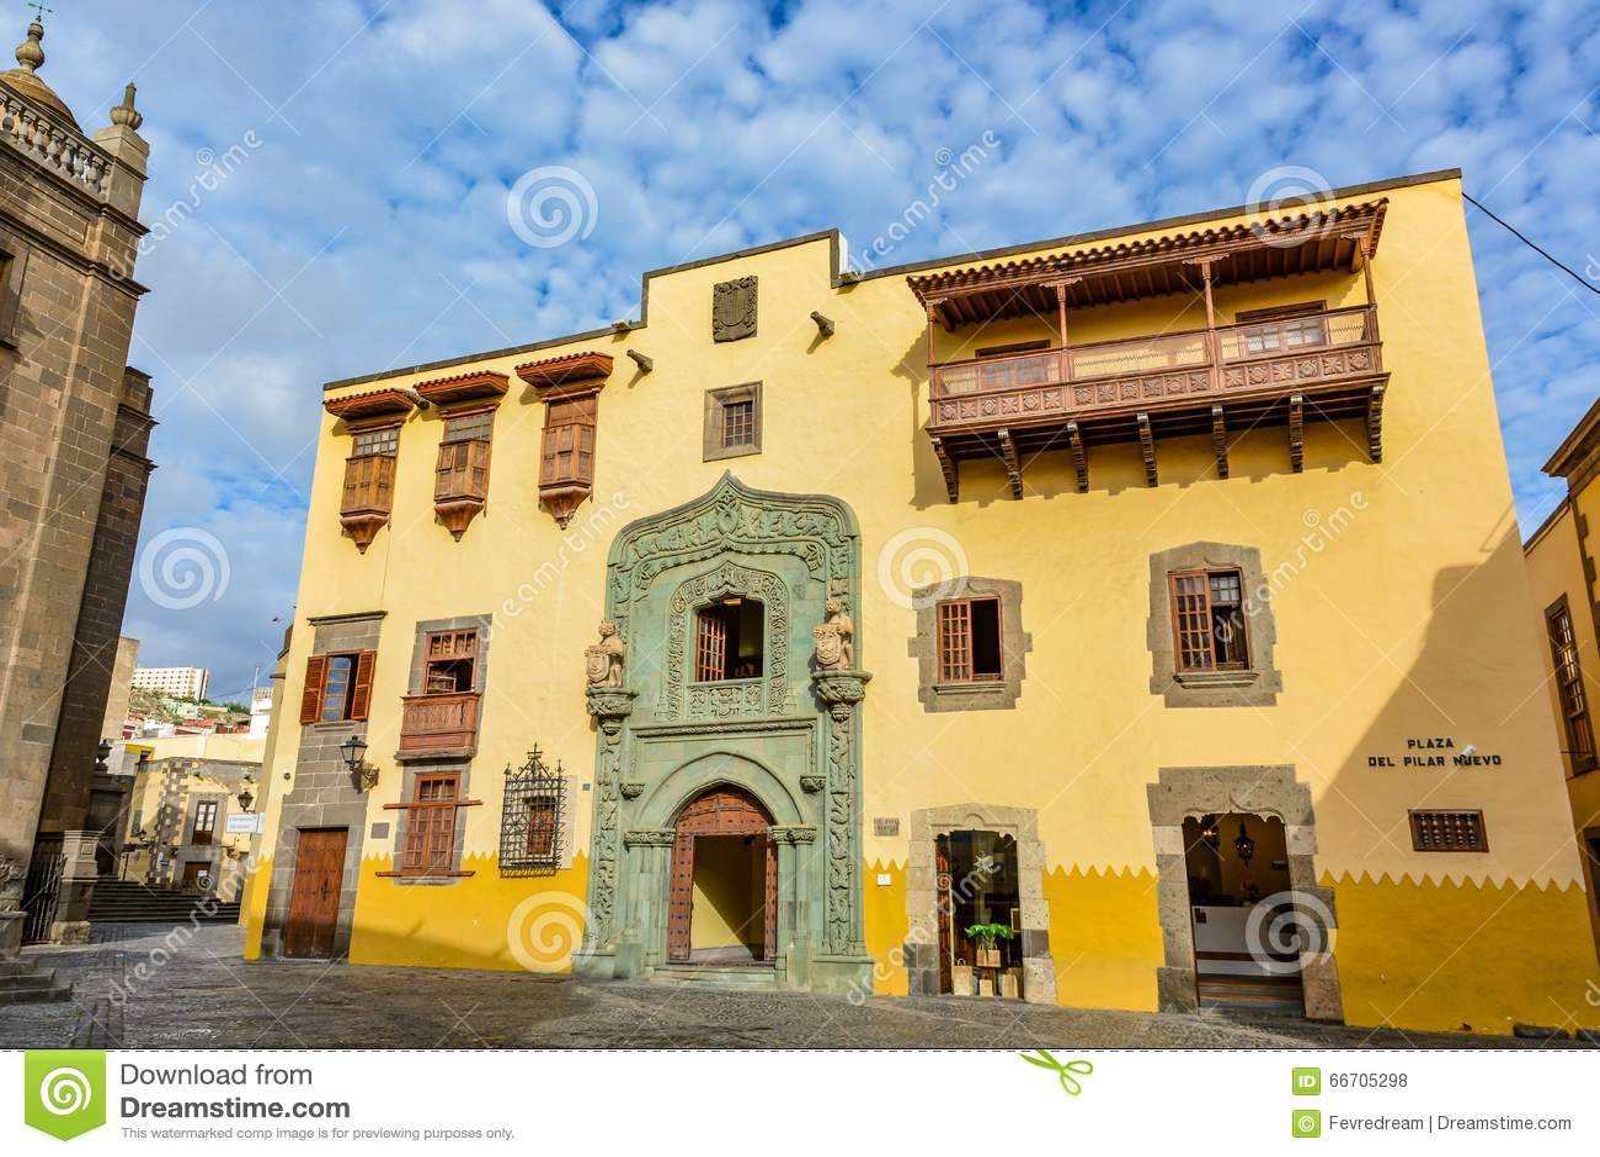 Casa de colon the house of christopher columbus las palmas gran canaria spain stock photo - Apartamentos puerto rico las palmas ...